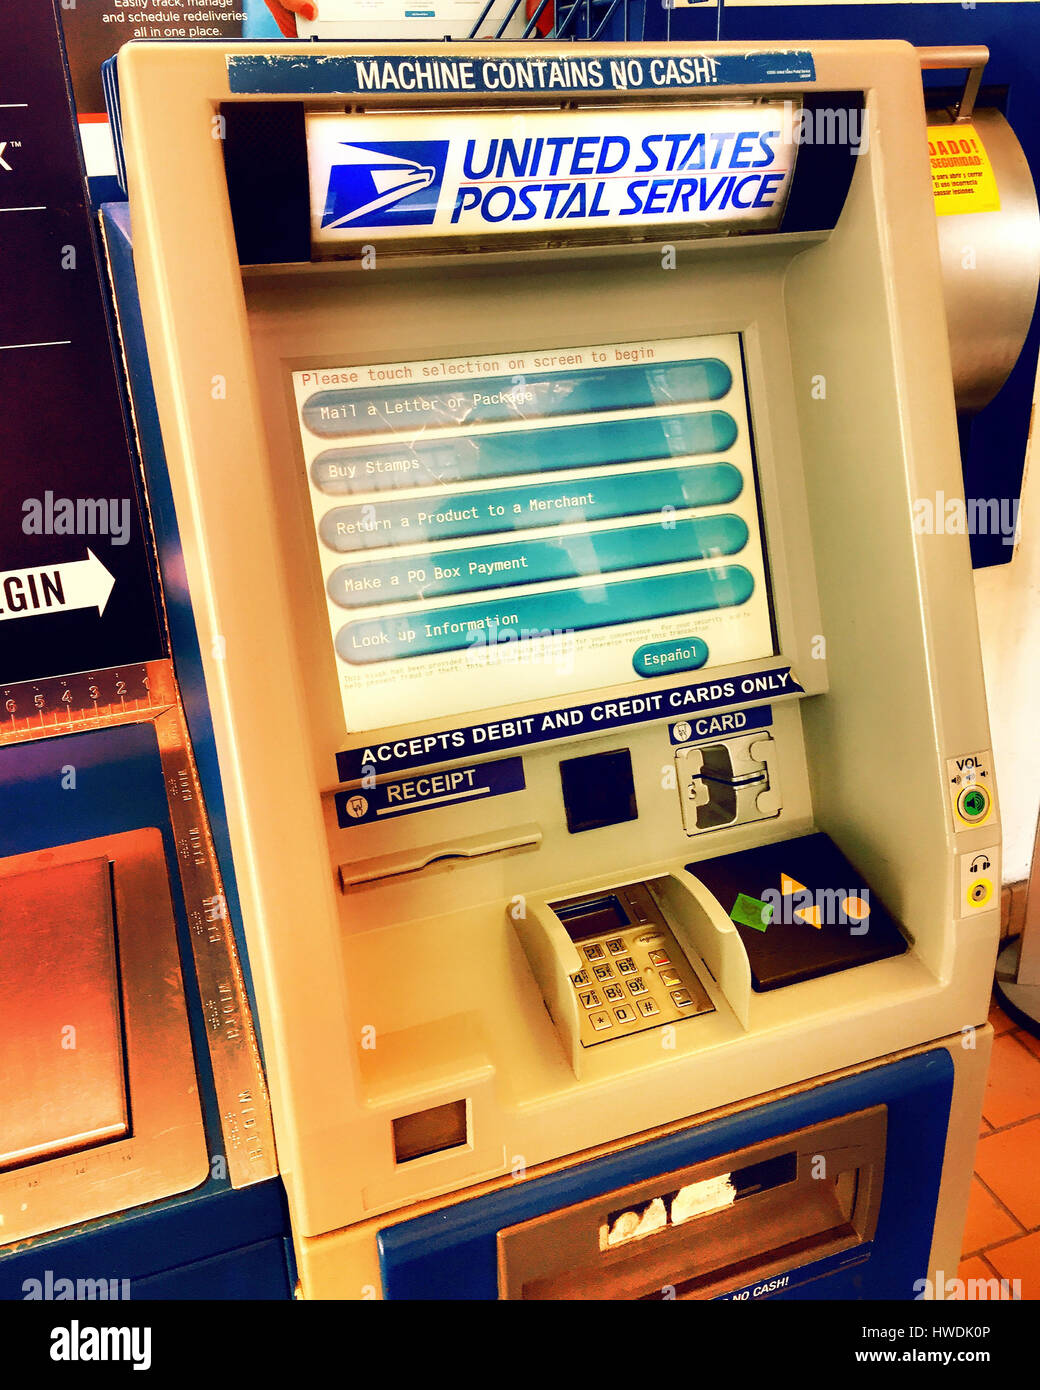 Automated Postal Center Kiosk, USPS, USA - Stock Image